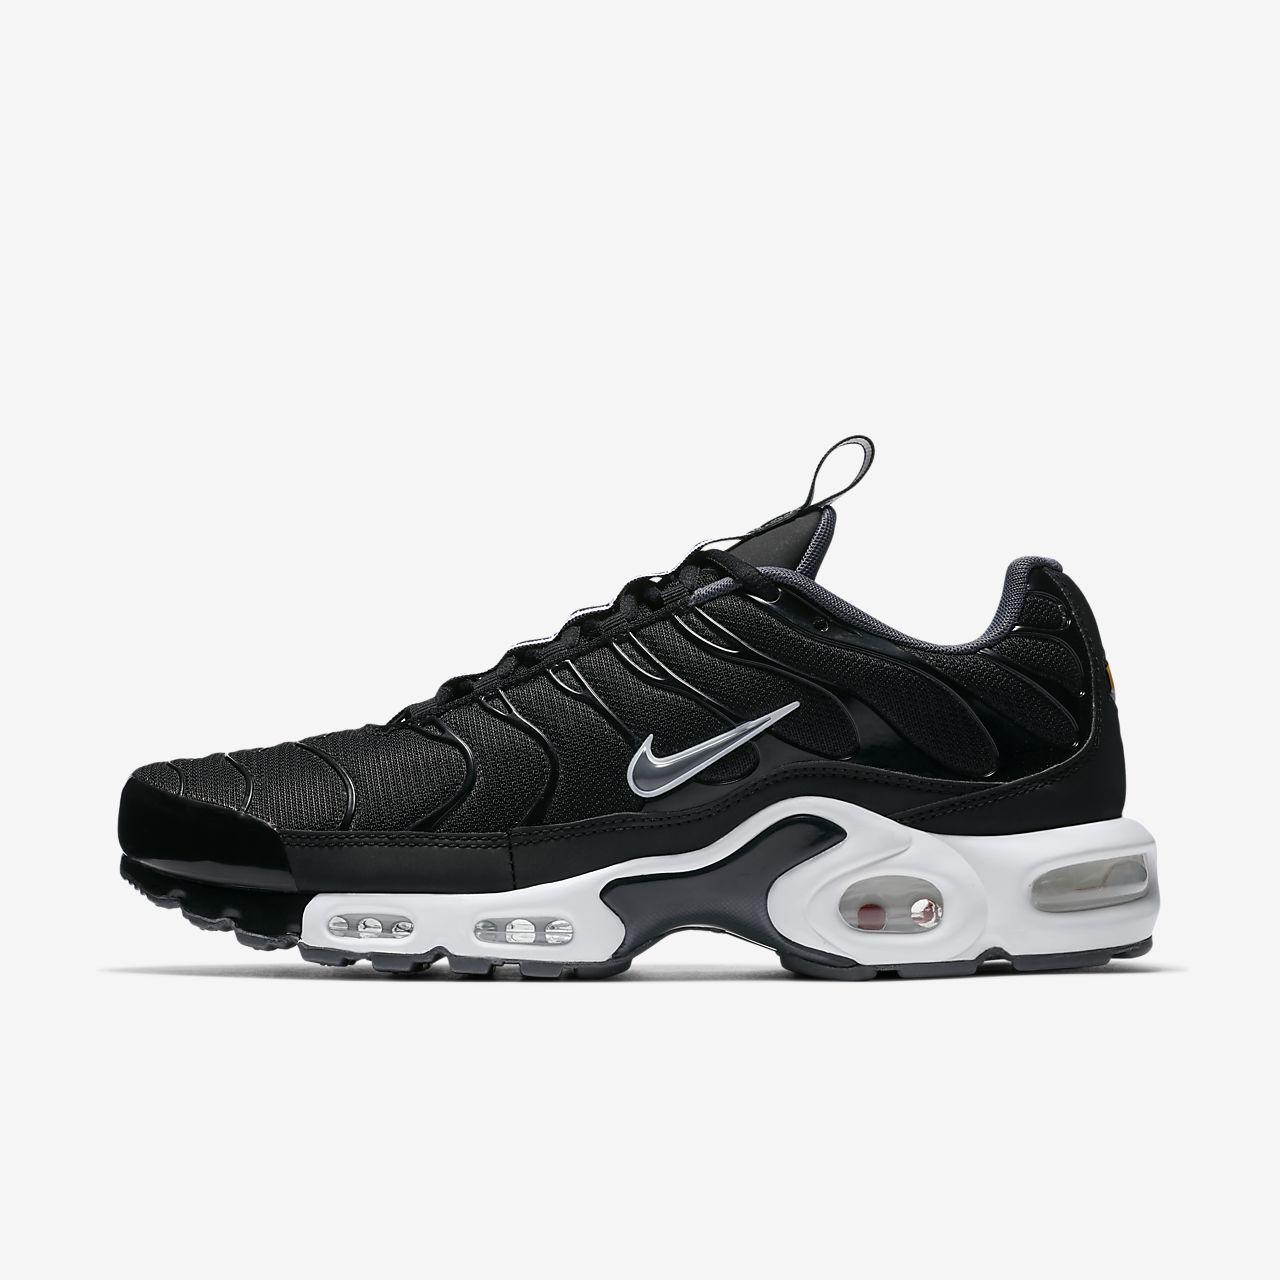 new product da3e2 4a2d2 ... discount nike air max plus tn se sko til mænd 79620 9734d